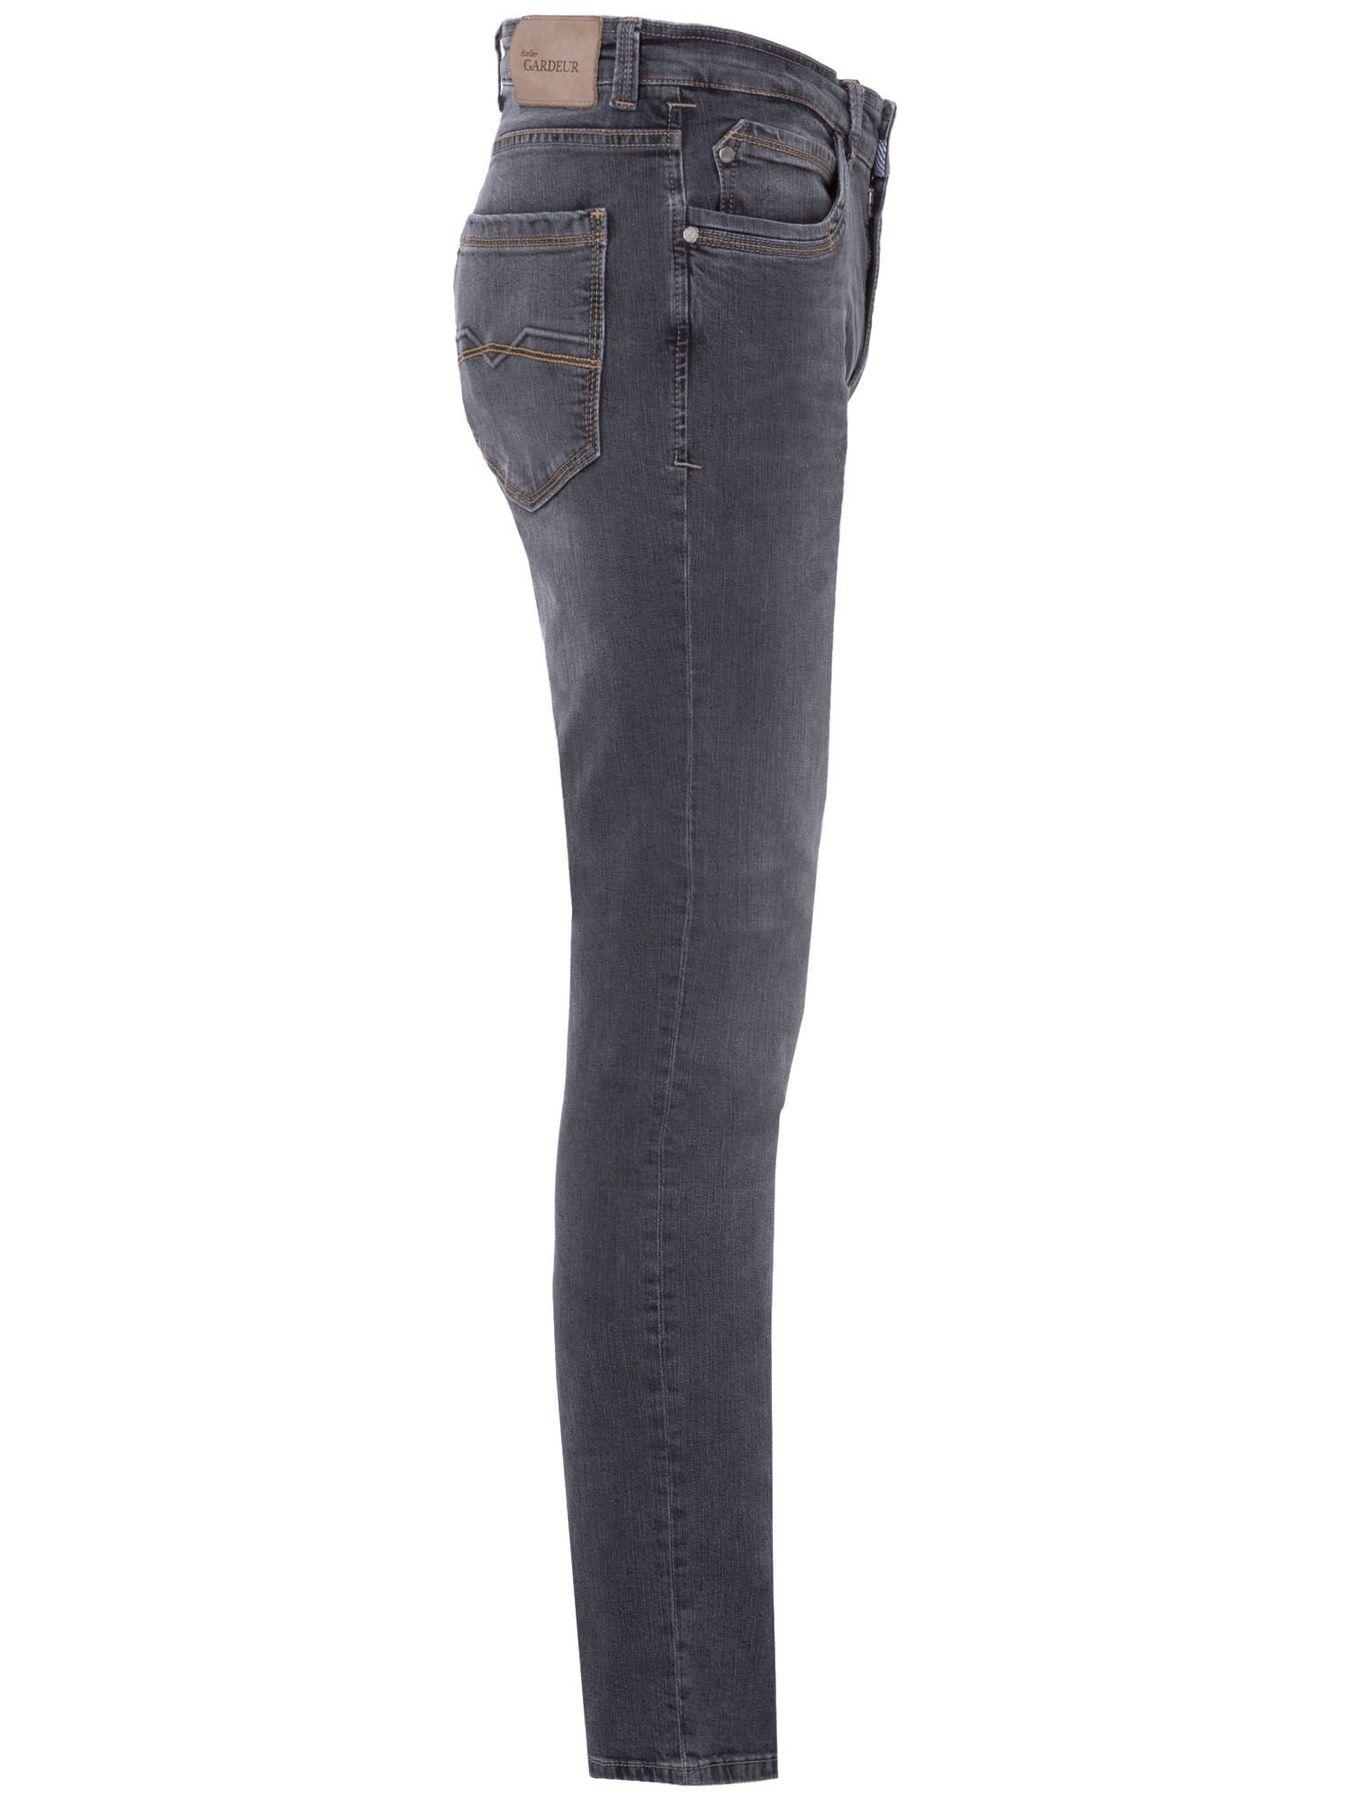 Atelier Gardeur - Herren 5-Pocket Jeans Superflex, Farben black(99), dark stone(68), stone blue(67), anthrazit(198) BATU (71001) – Bild 15